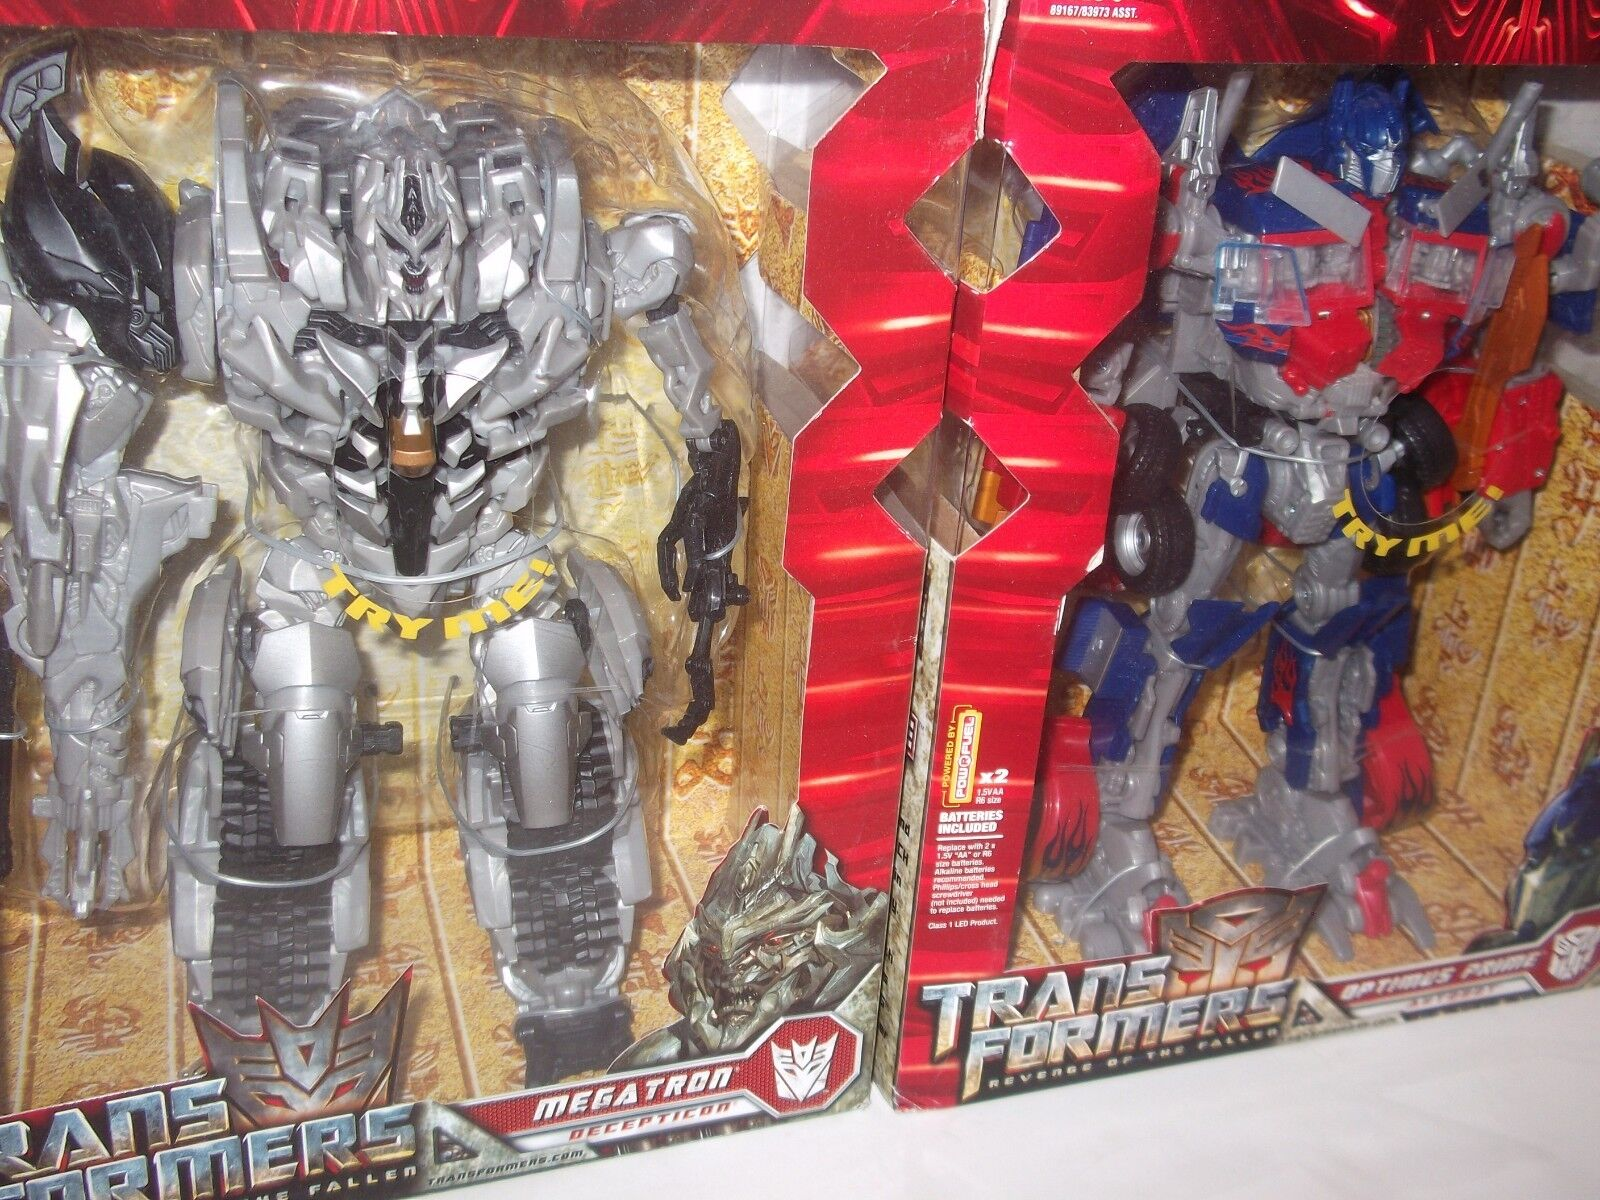 Transformers Revenge Of The Fallen redF Leader Class LOT OPTIMUS & MEGATRON MISB